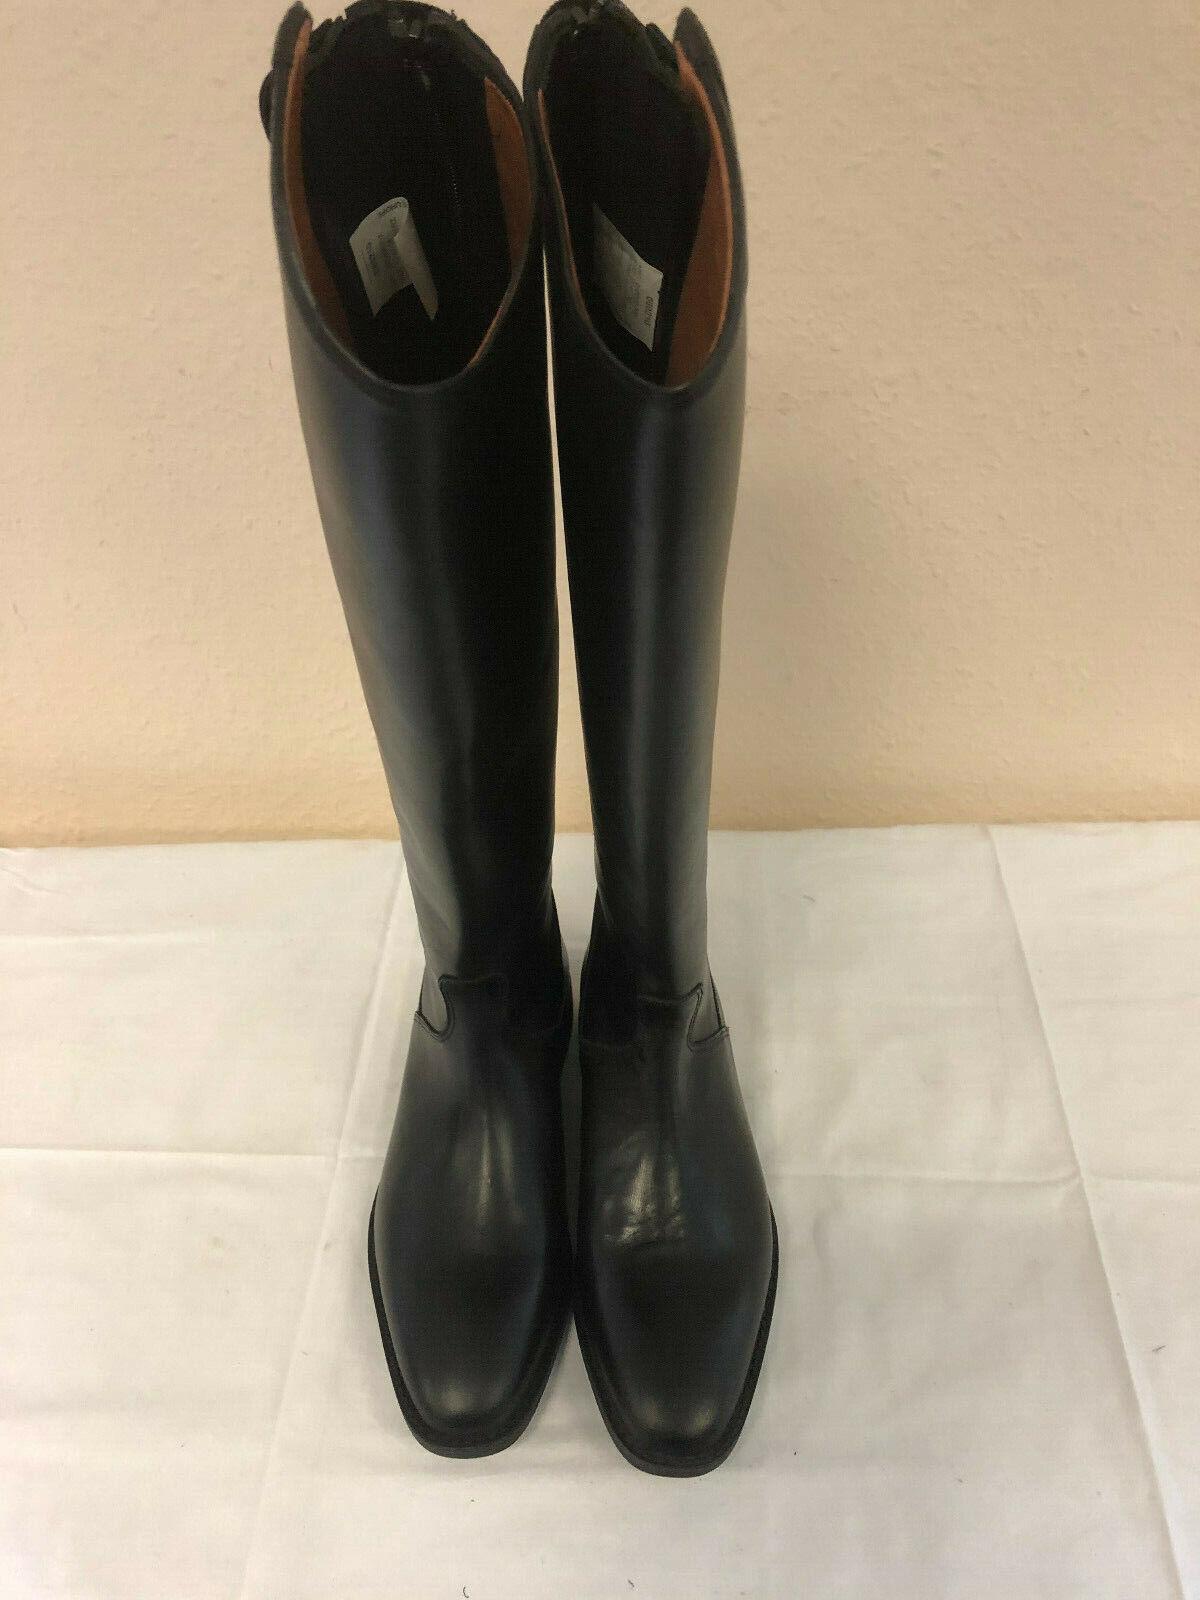 Cavallo reitbotas botas Summer, negro, talla 38 h48 w41